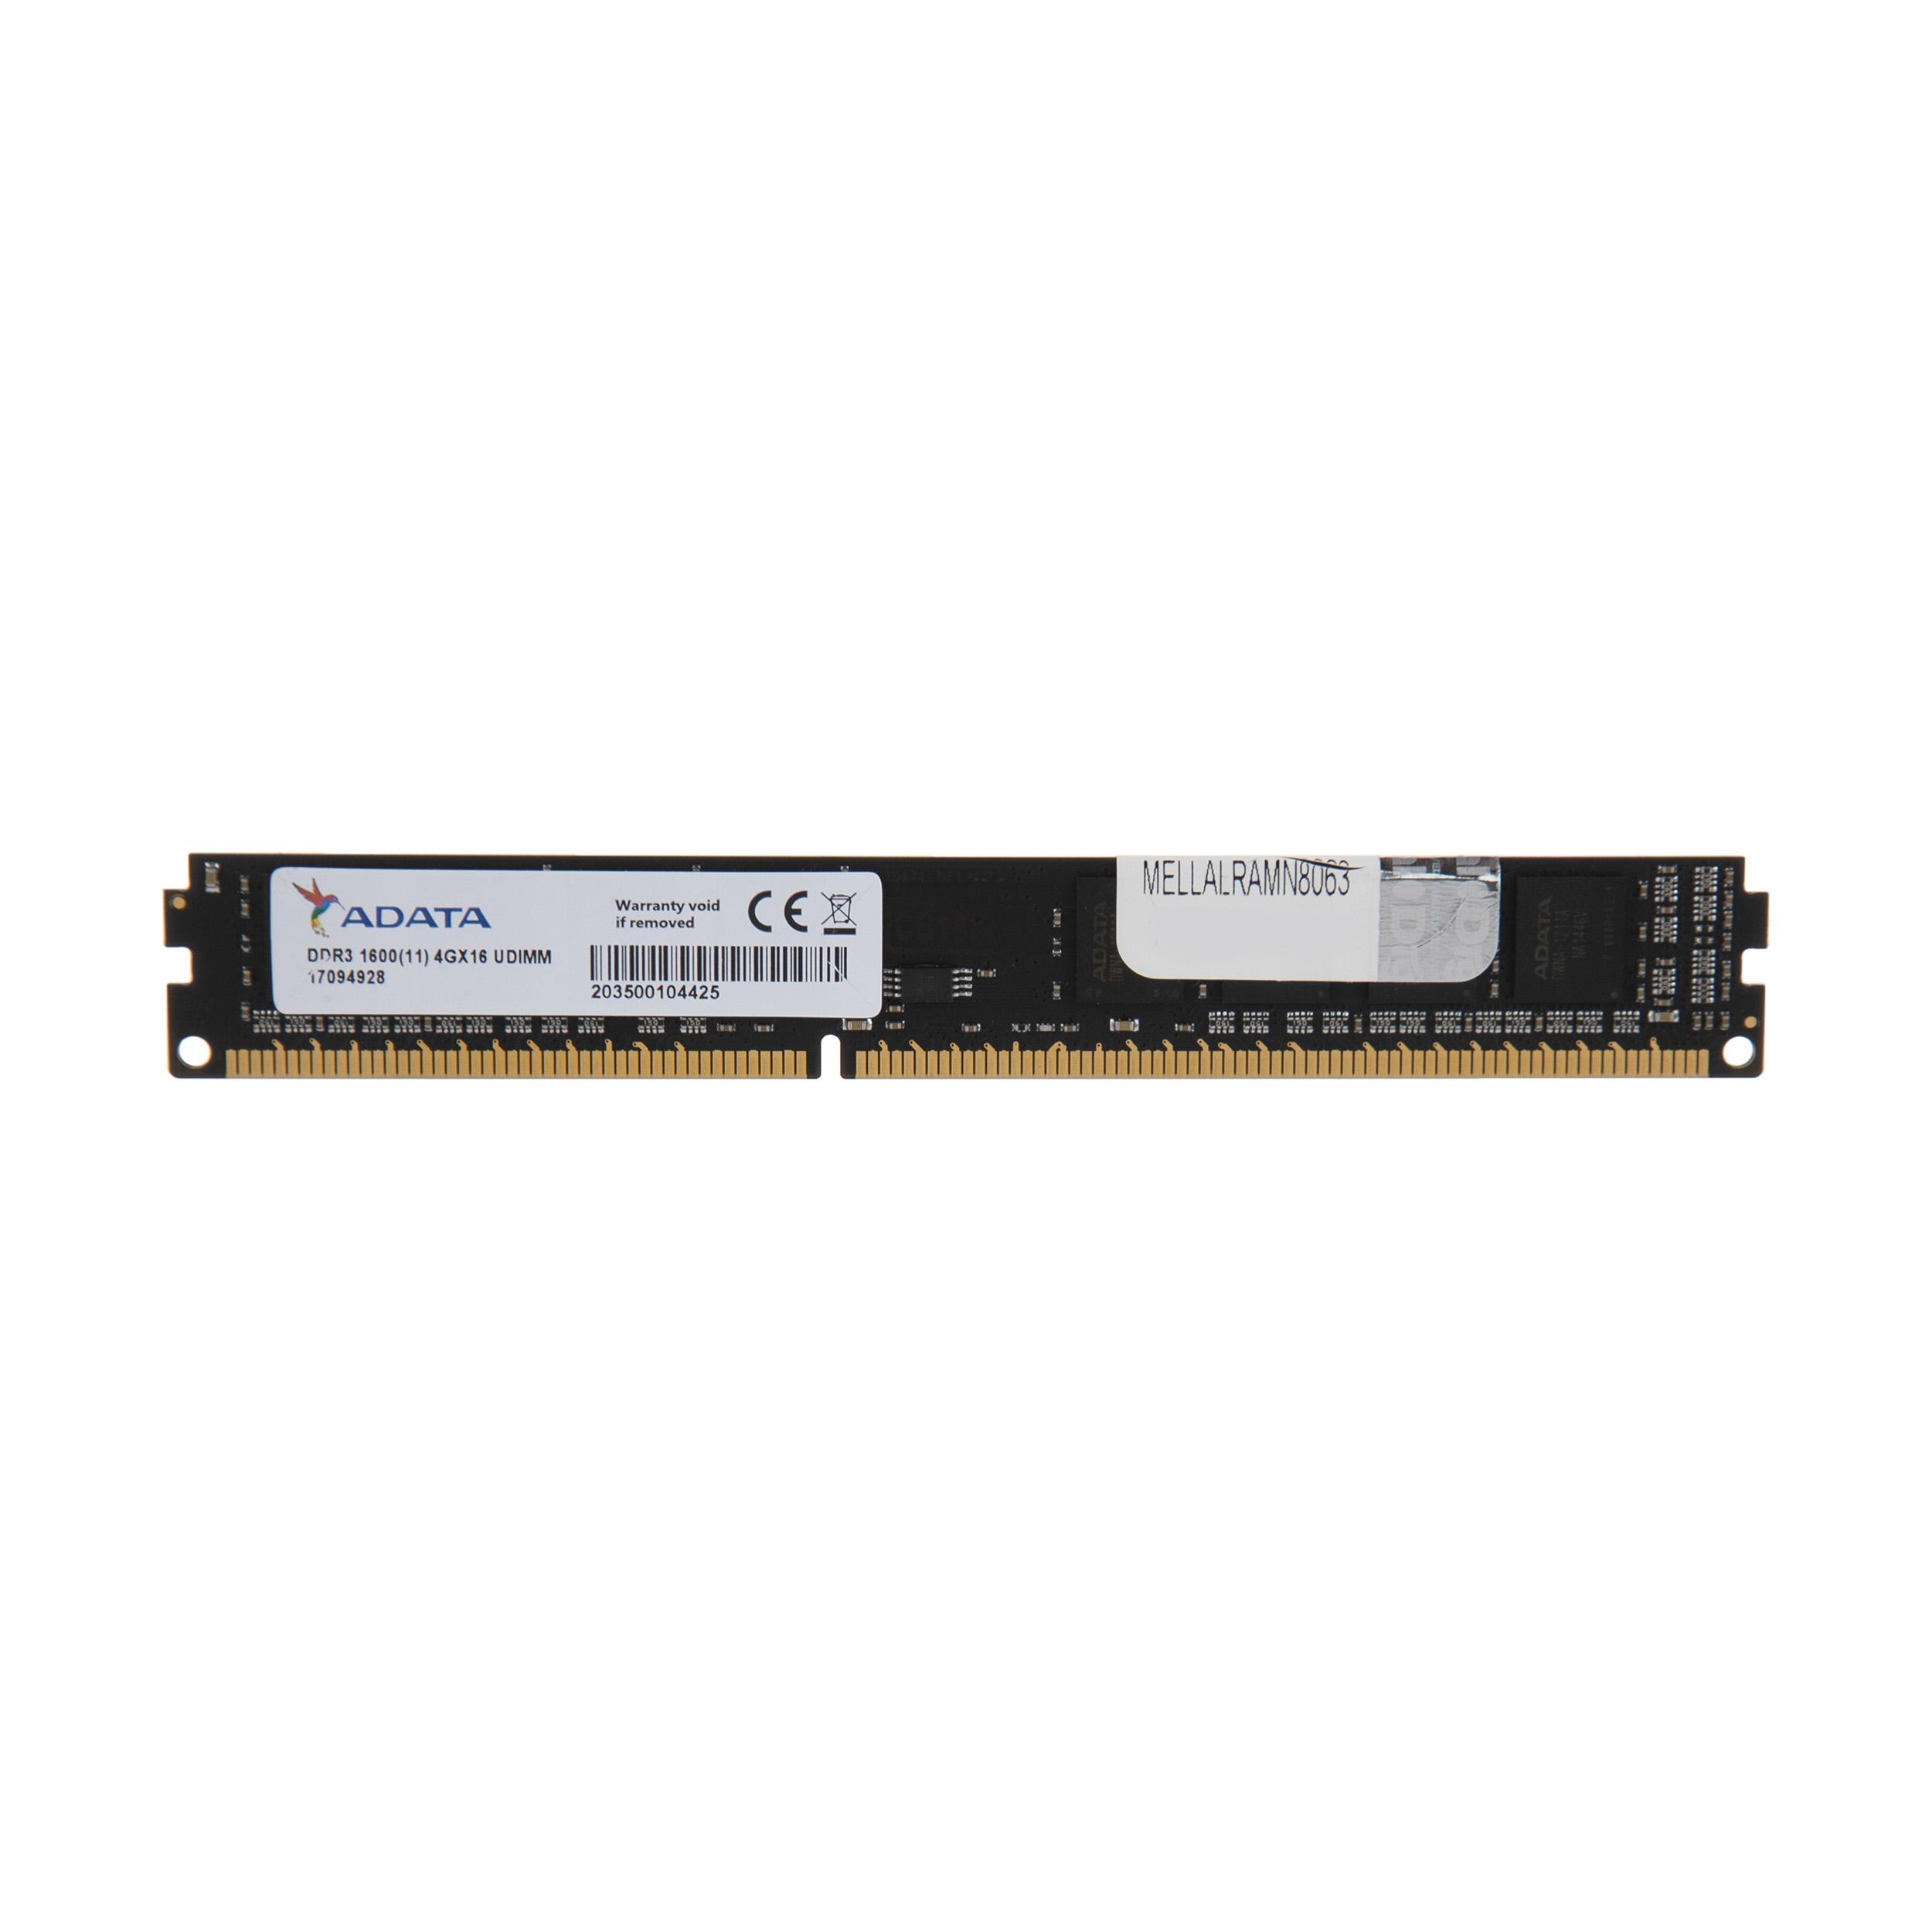 رم تک کاناله ای دیتا مدل DDR3 1600MHz CL11 ظرفیت 4 گیگابایت